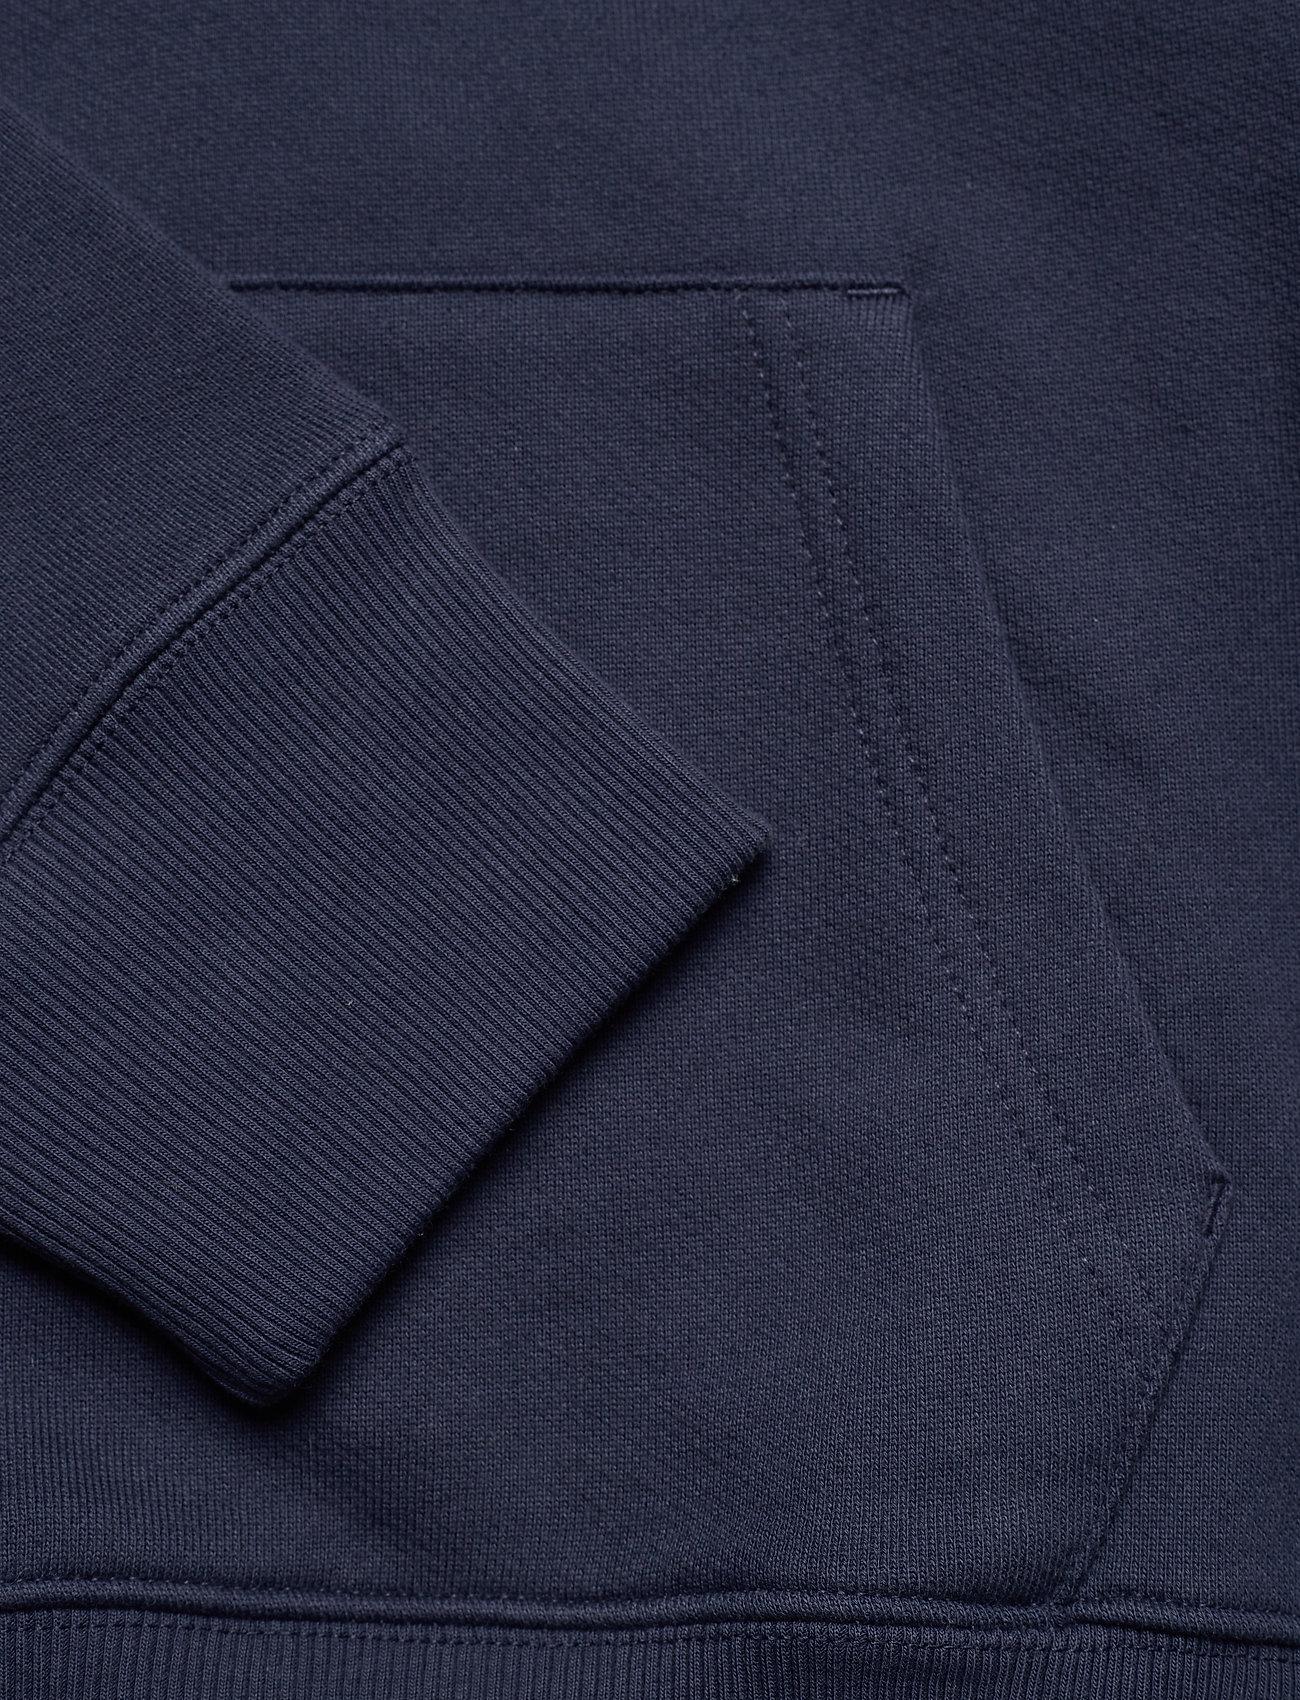 Tommy Jeans - TJM HALF ZIP HOODIE - sweats à capuche - twilight navy - 3